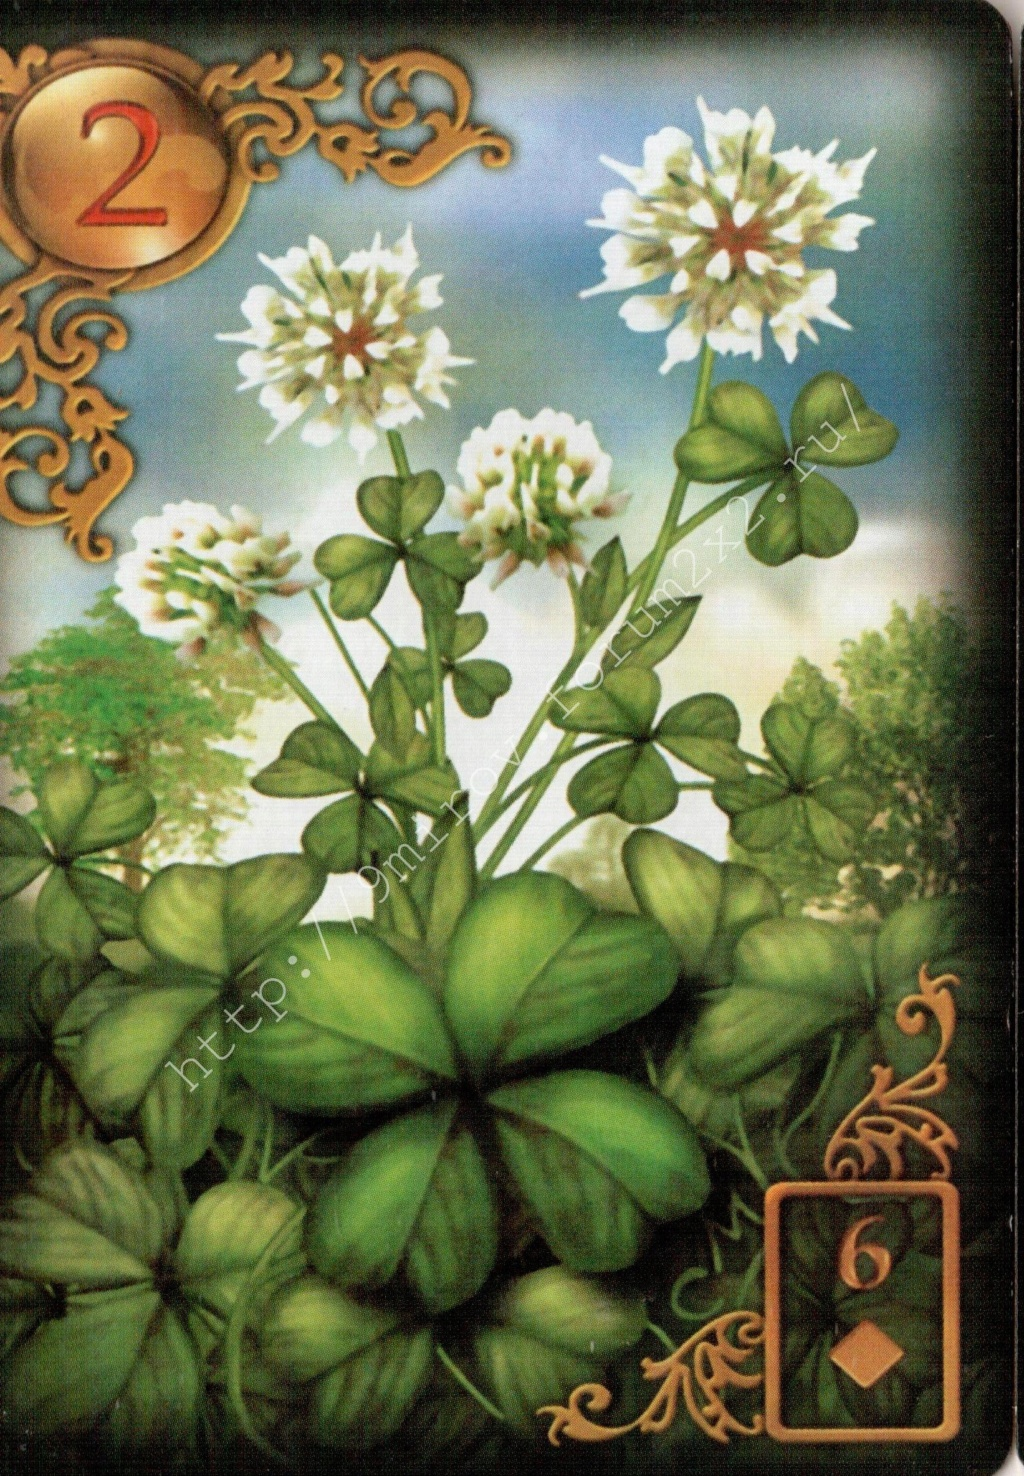 Золотые мечты Ленорман (Расширенное издание) | Gilded Reverie Lenormand. Галерея.  Waterm98